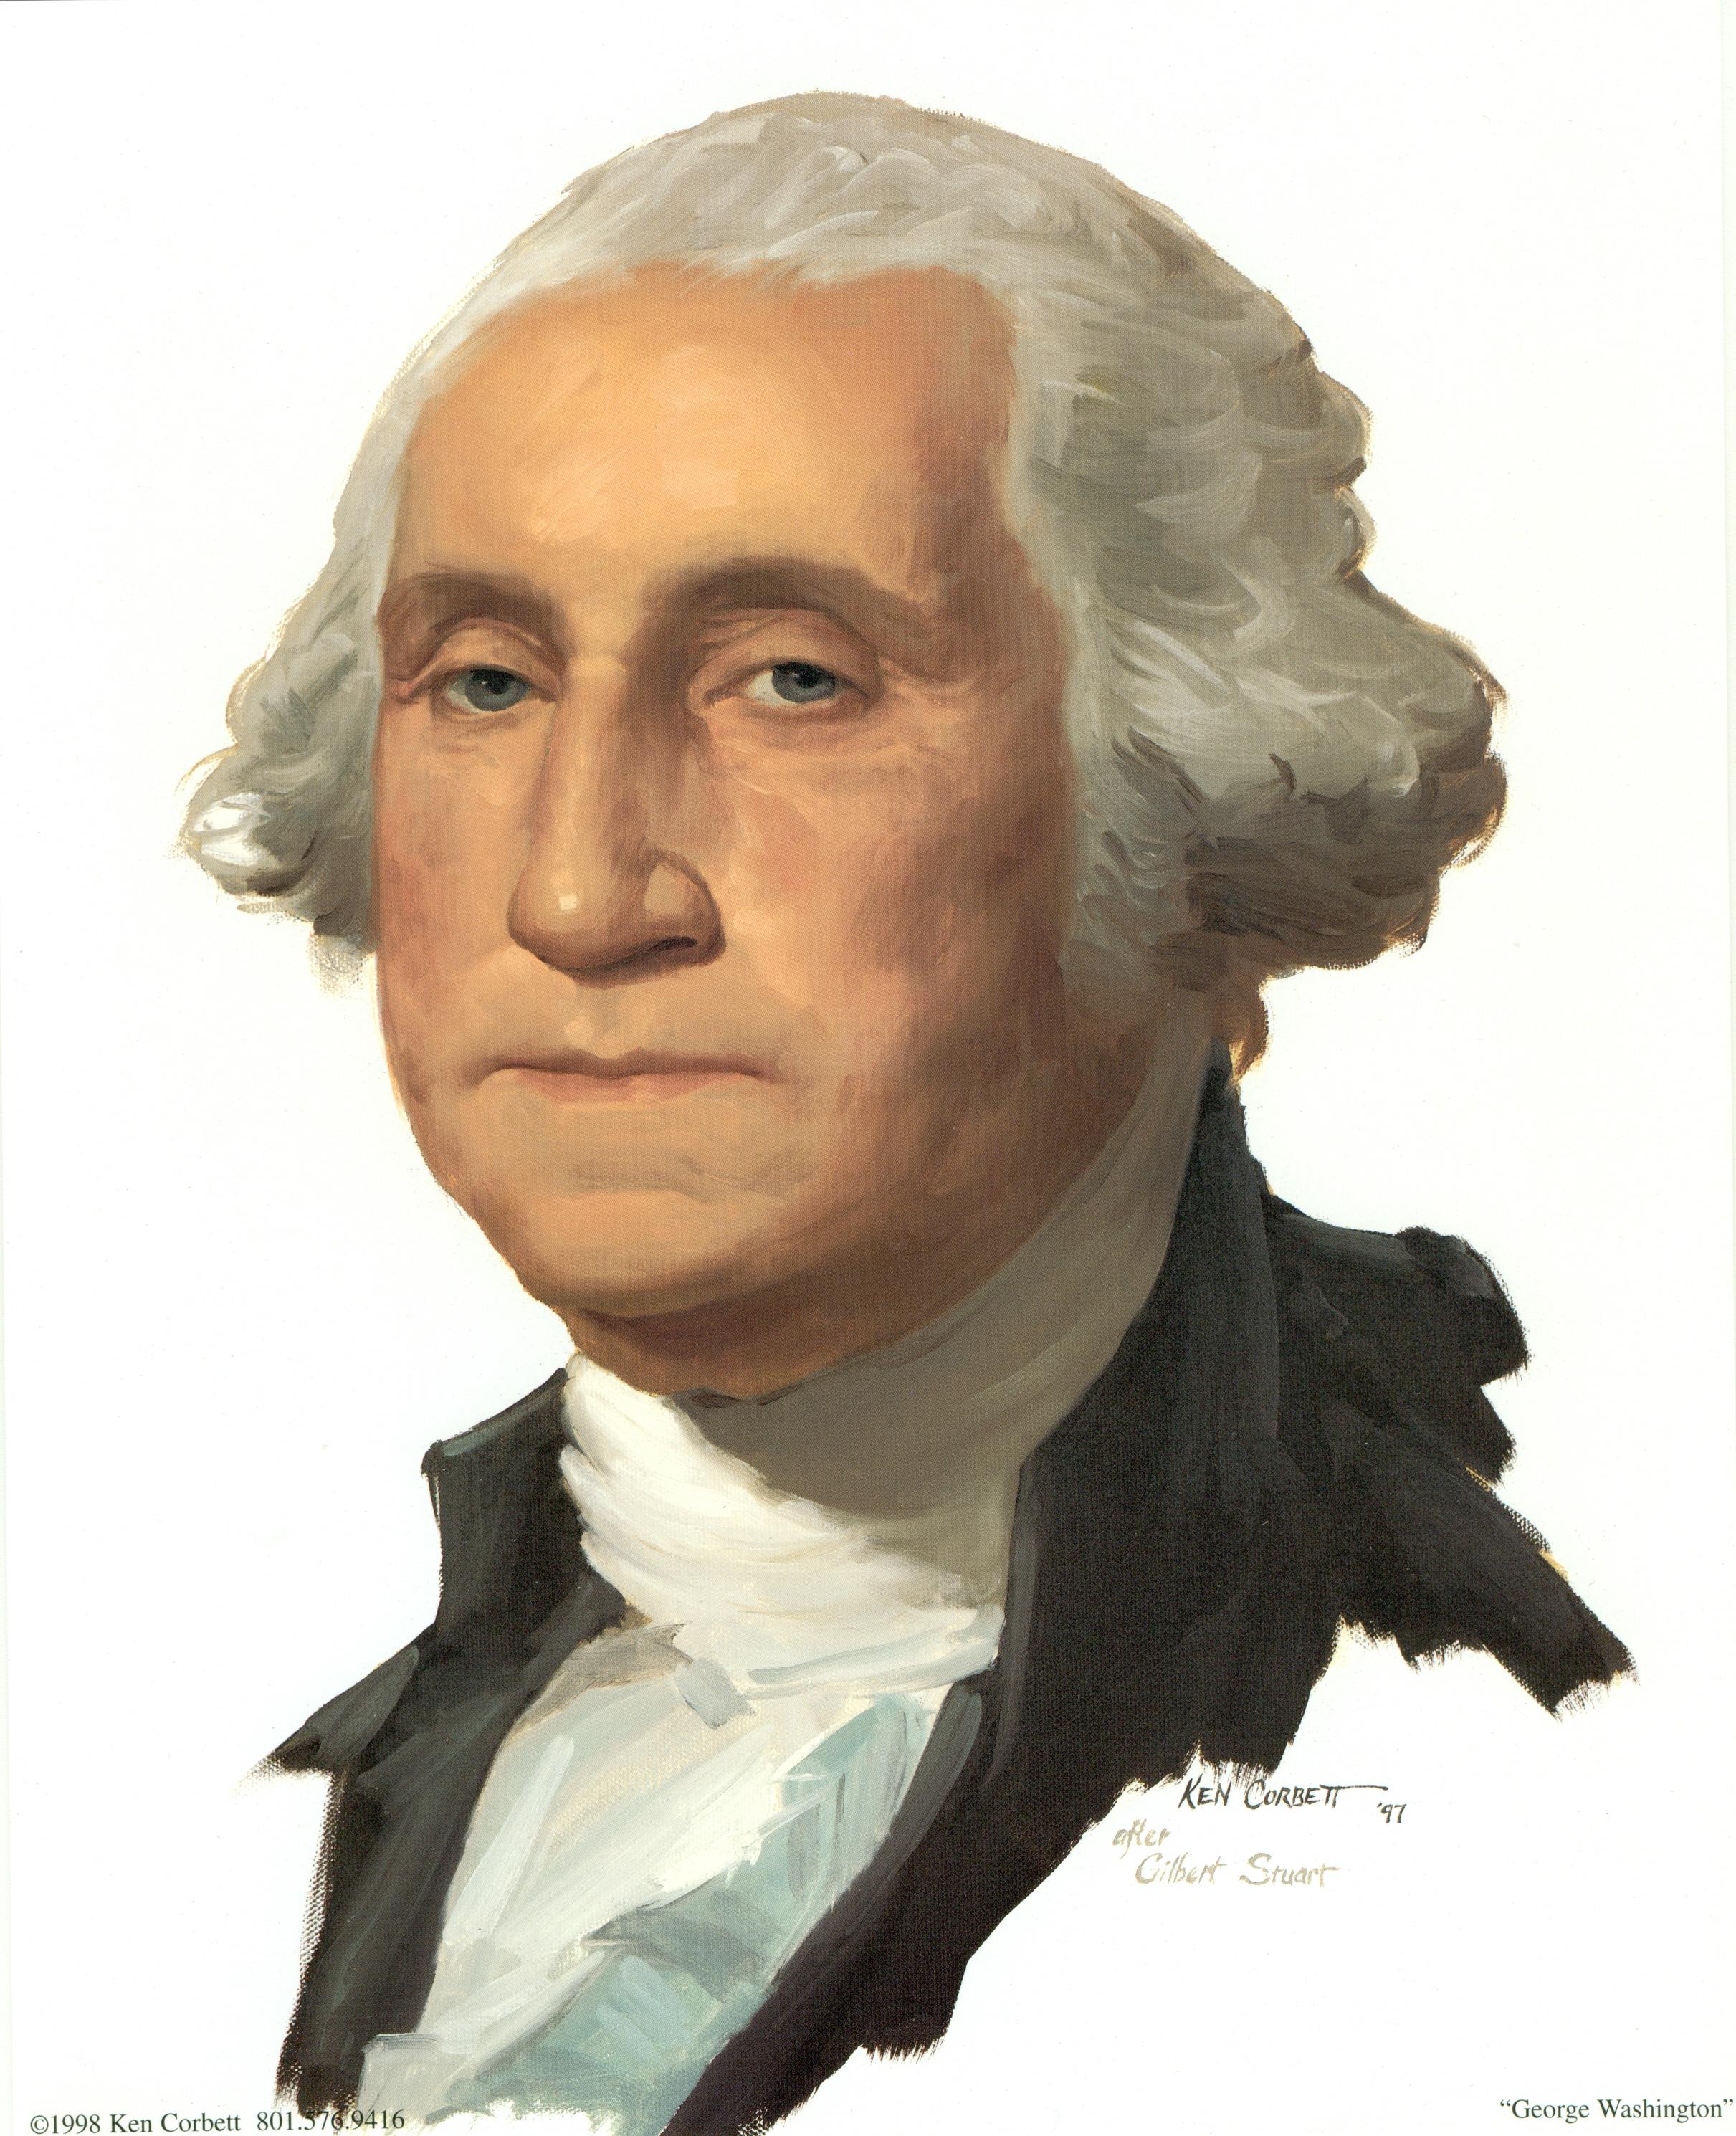 USA: george washington